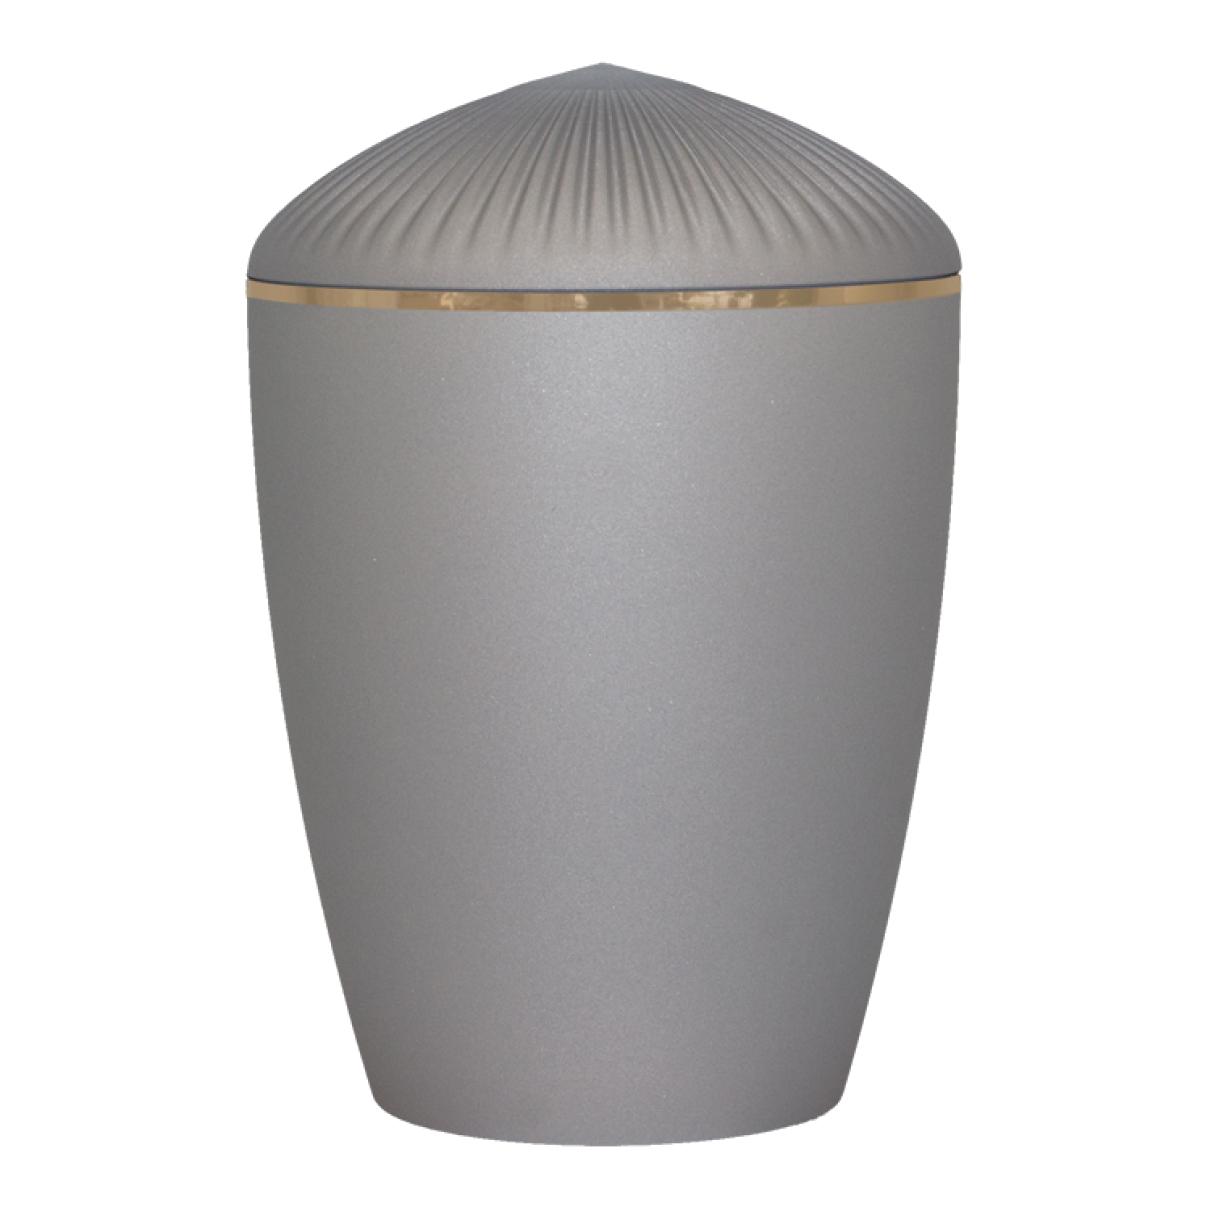 Ferndown Gold Band Cremation Urn – Velvet Grey